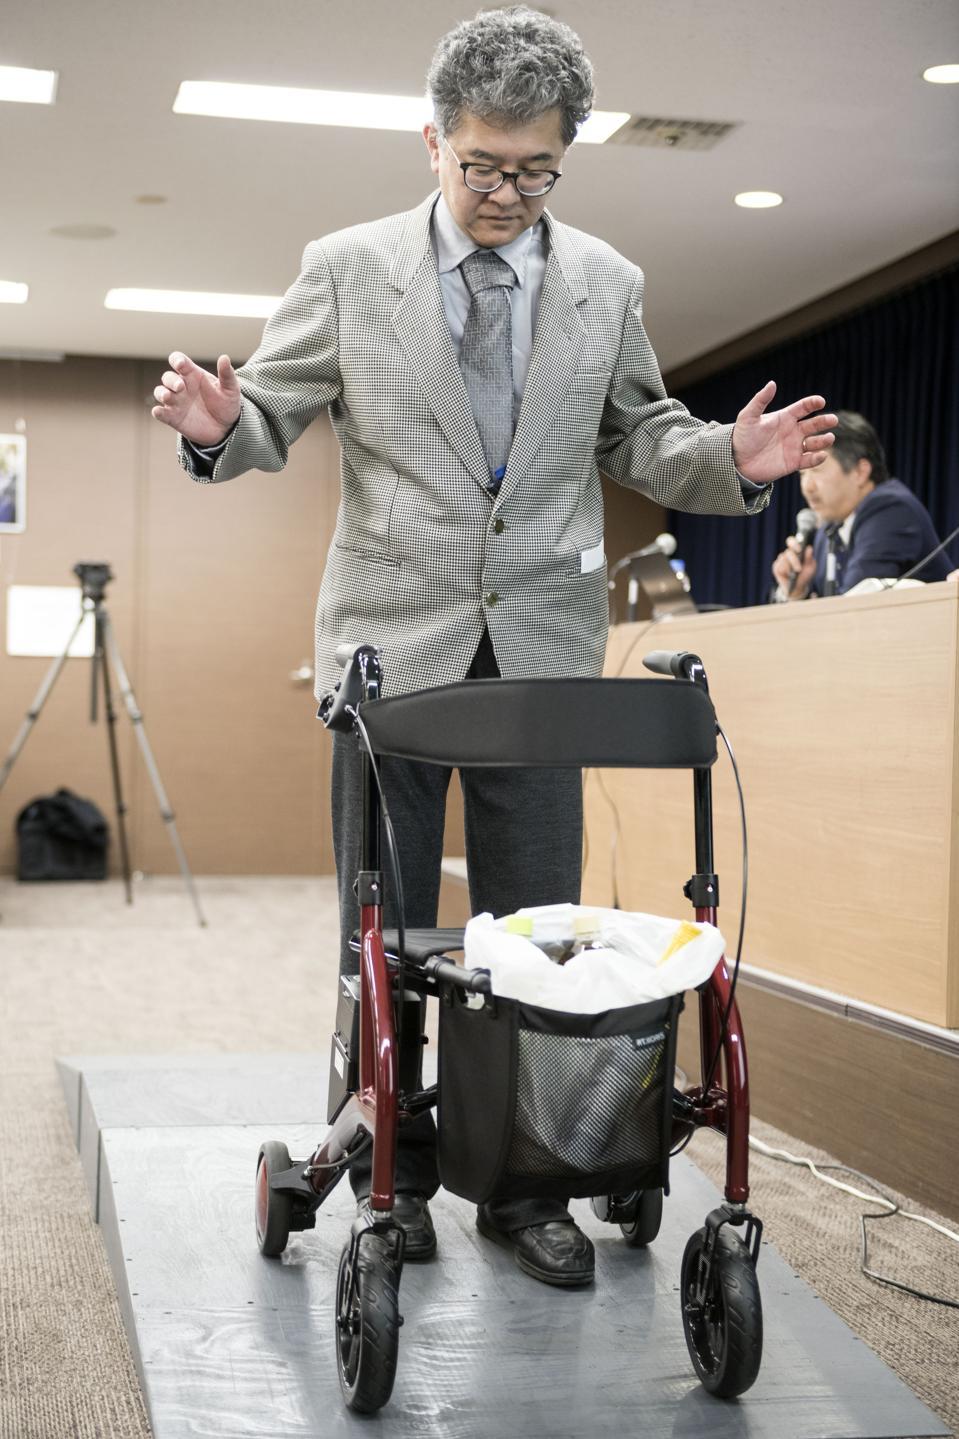 Development of Nursing-Care Robots in Japan